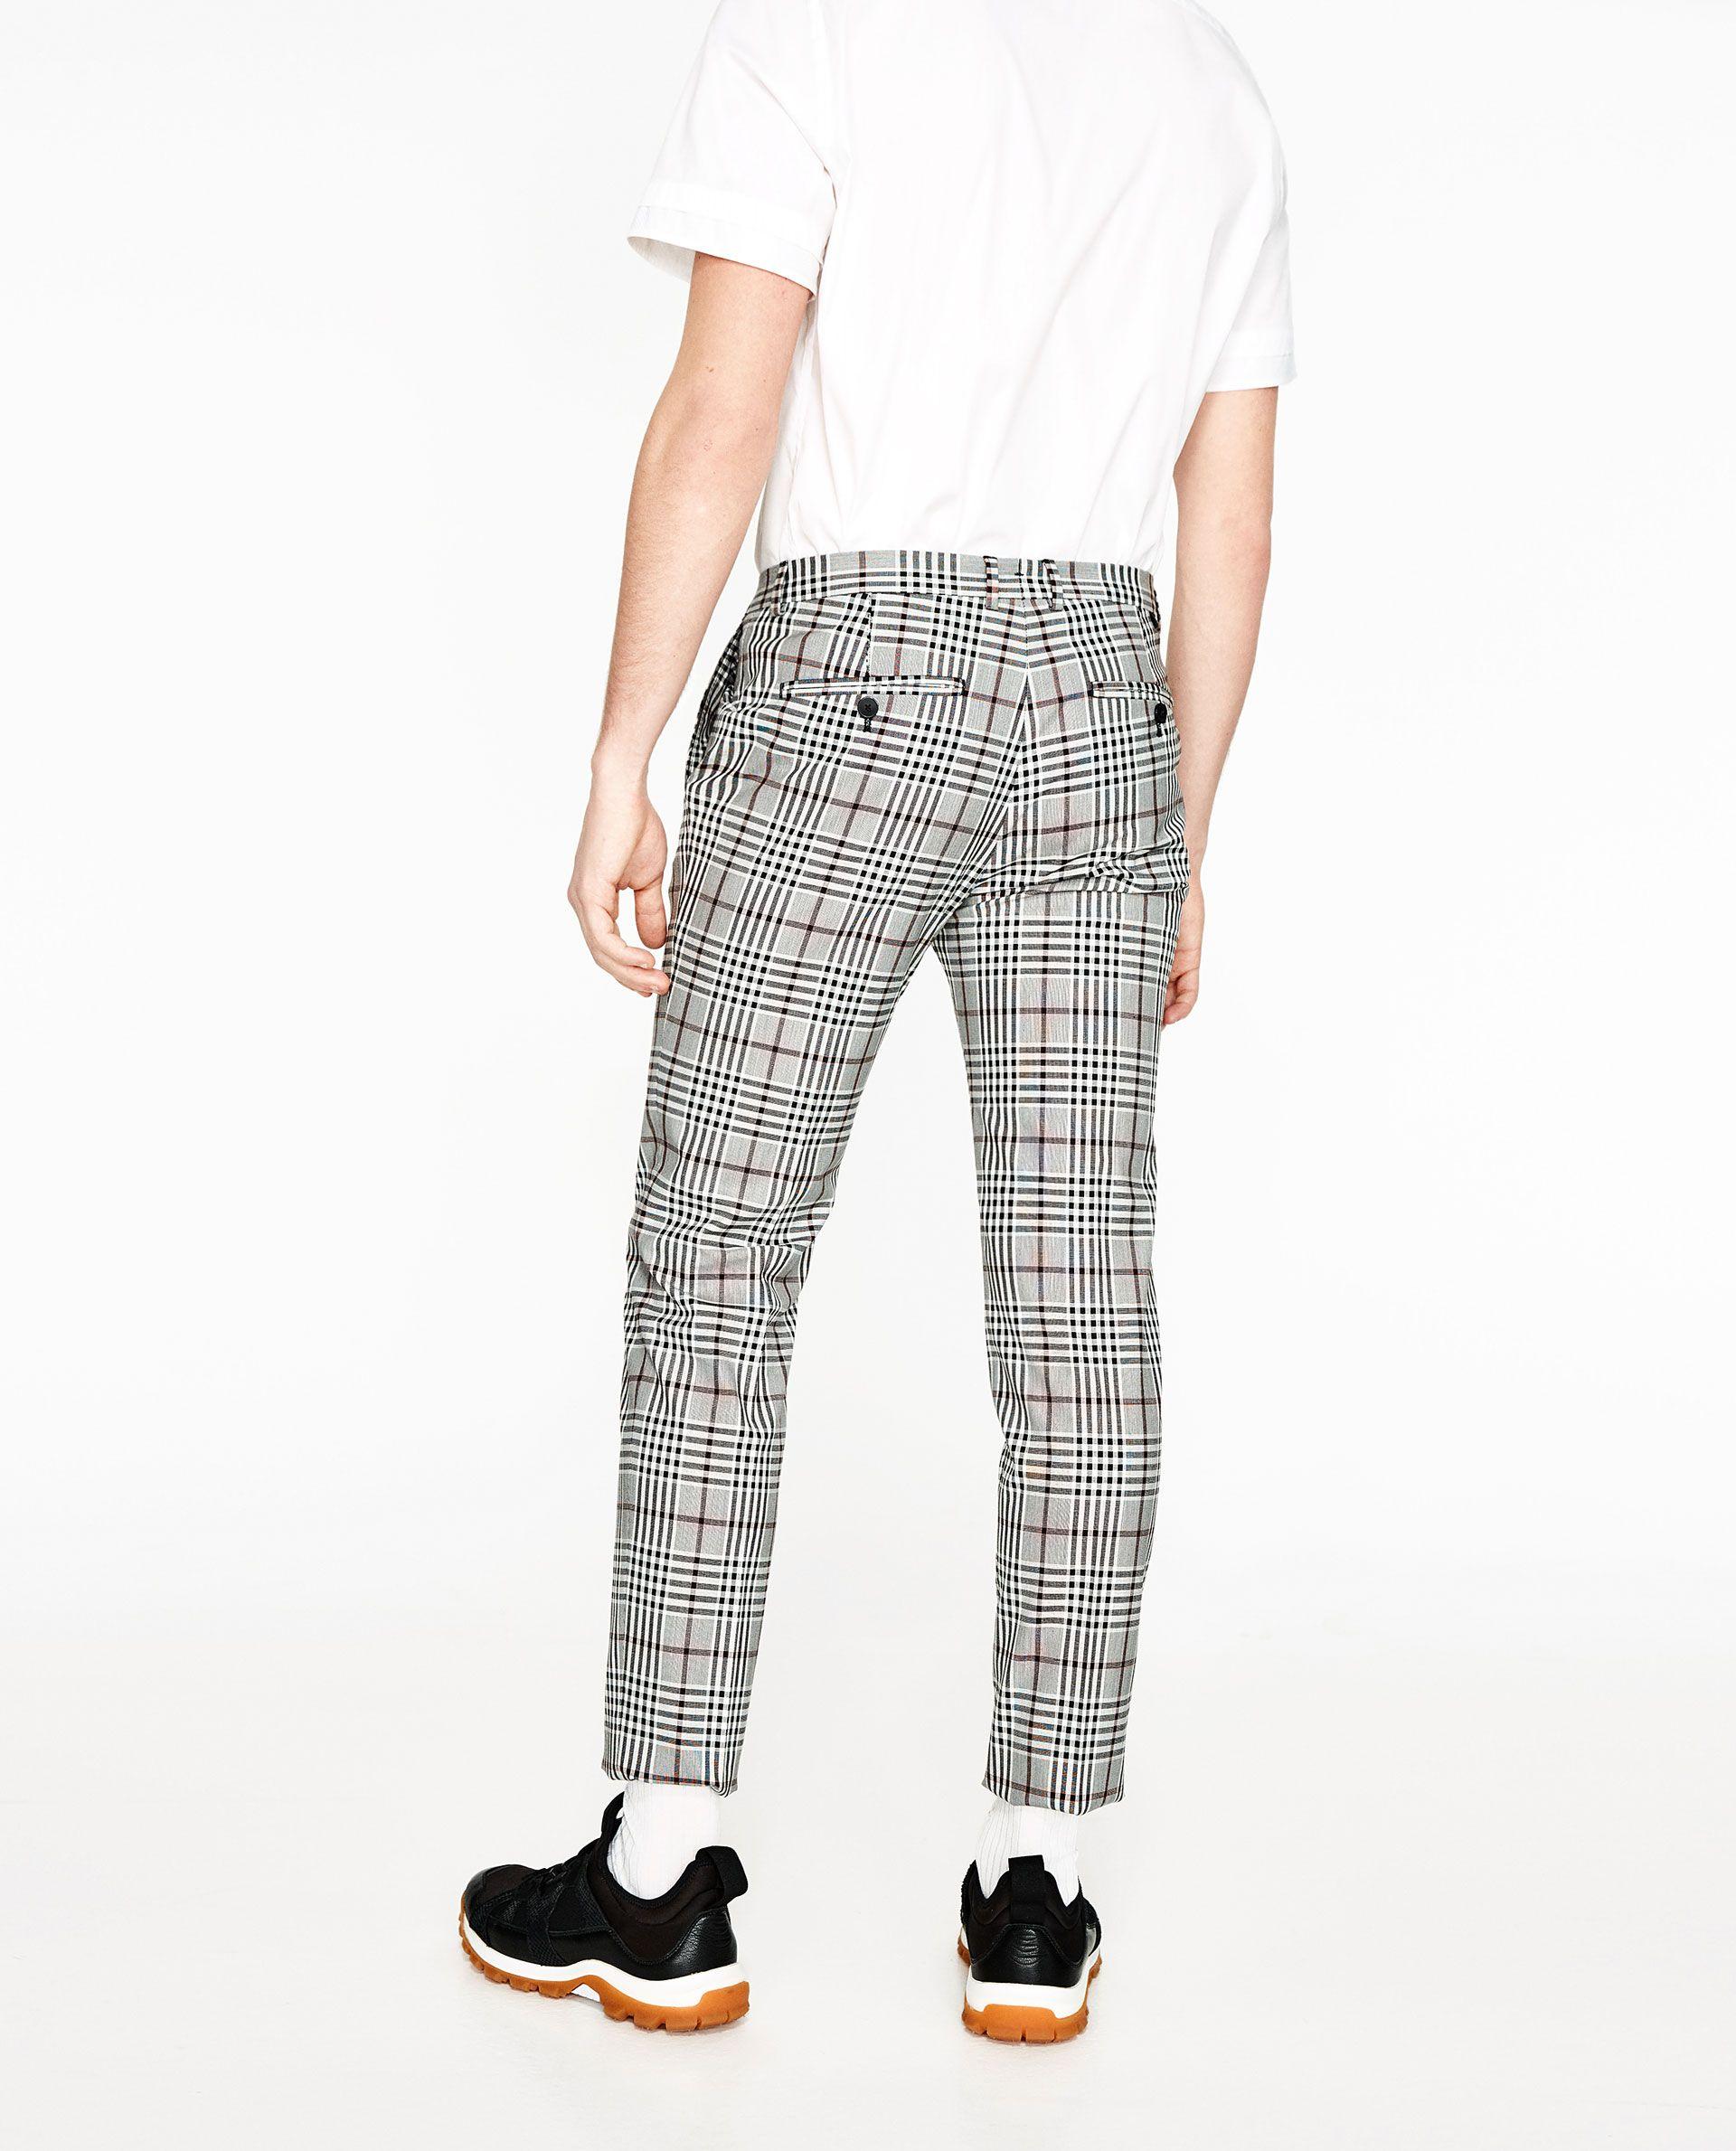 Pantalones Hombre Zara Mexico Fashion My Style Sweatpants